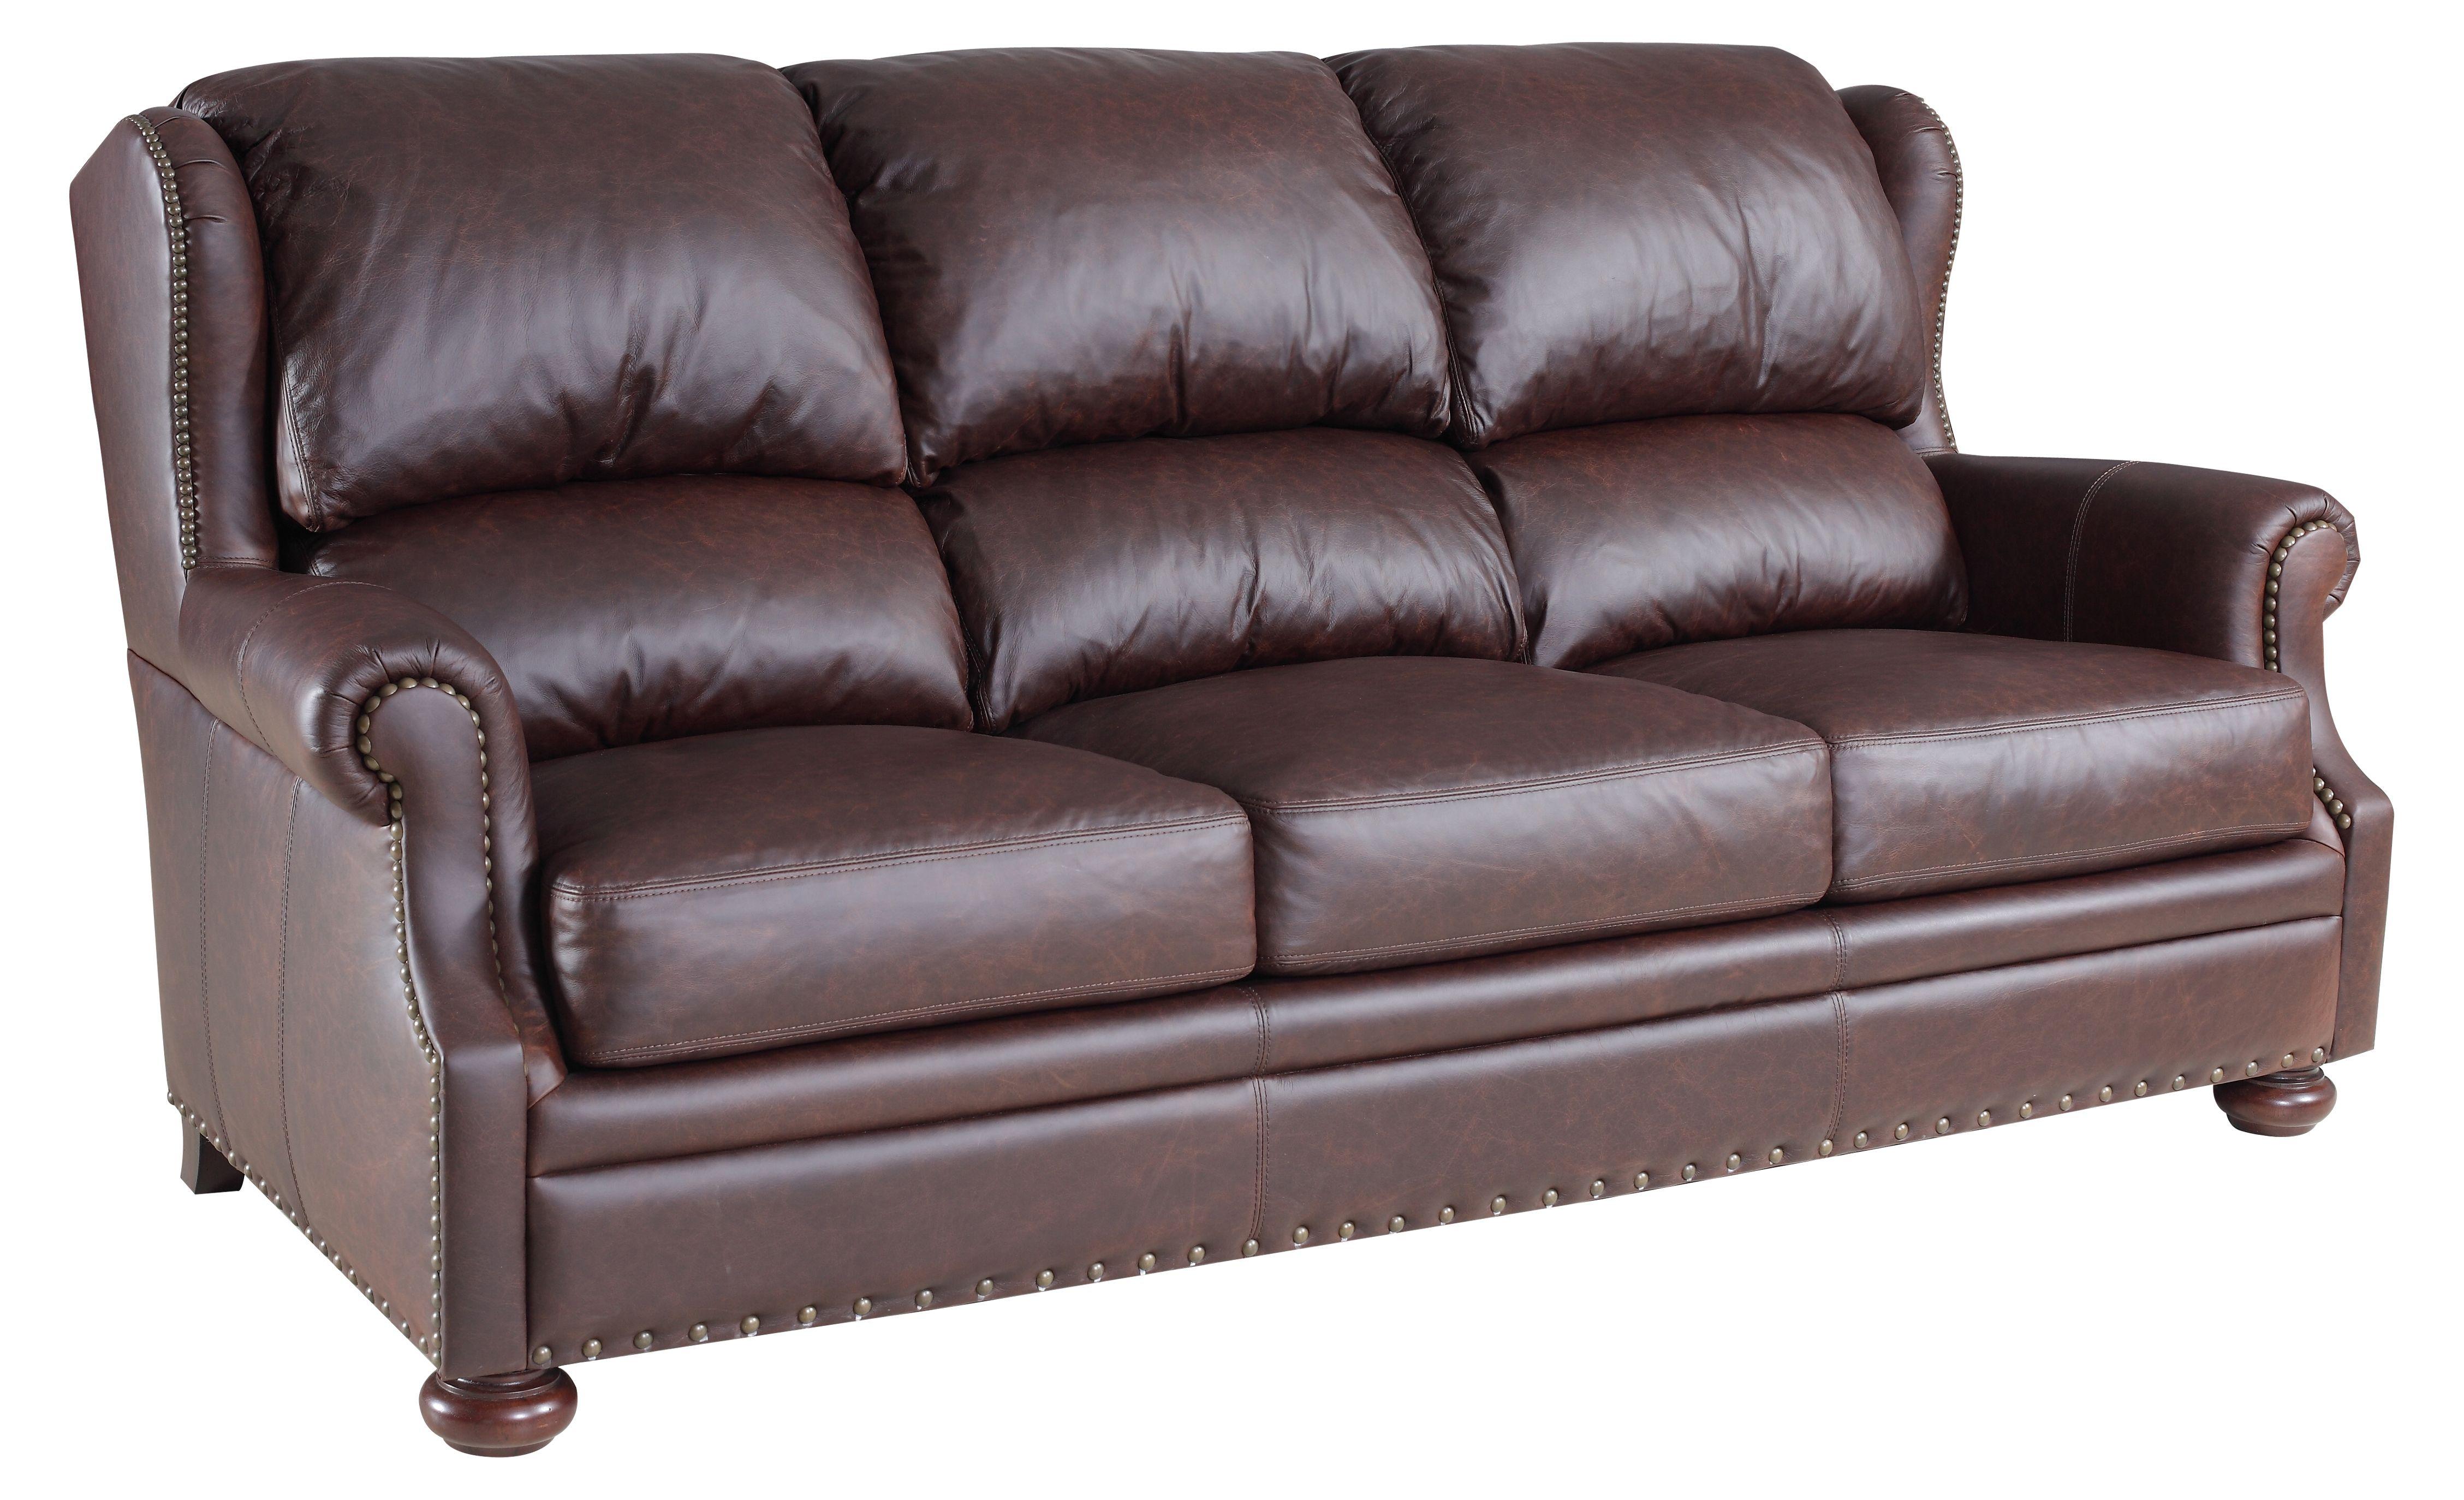 Hooker Furniture Stationary Sofa SS145-03-089   Hooker ...